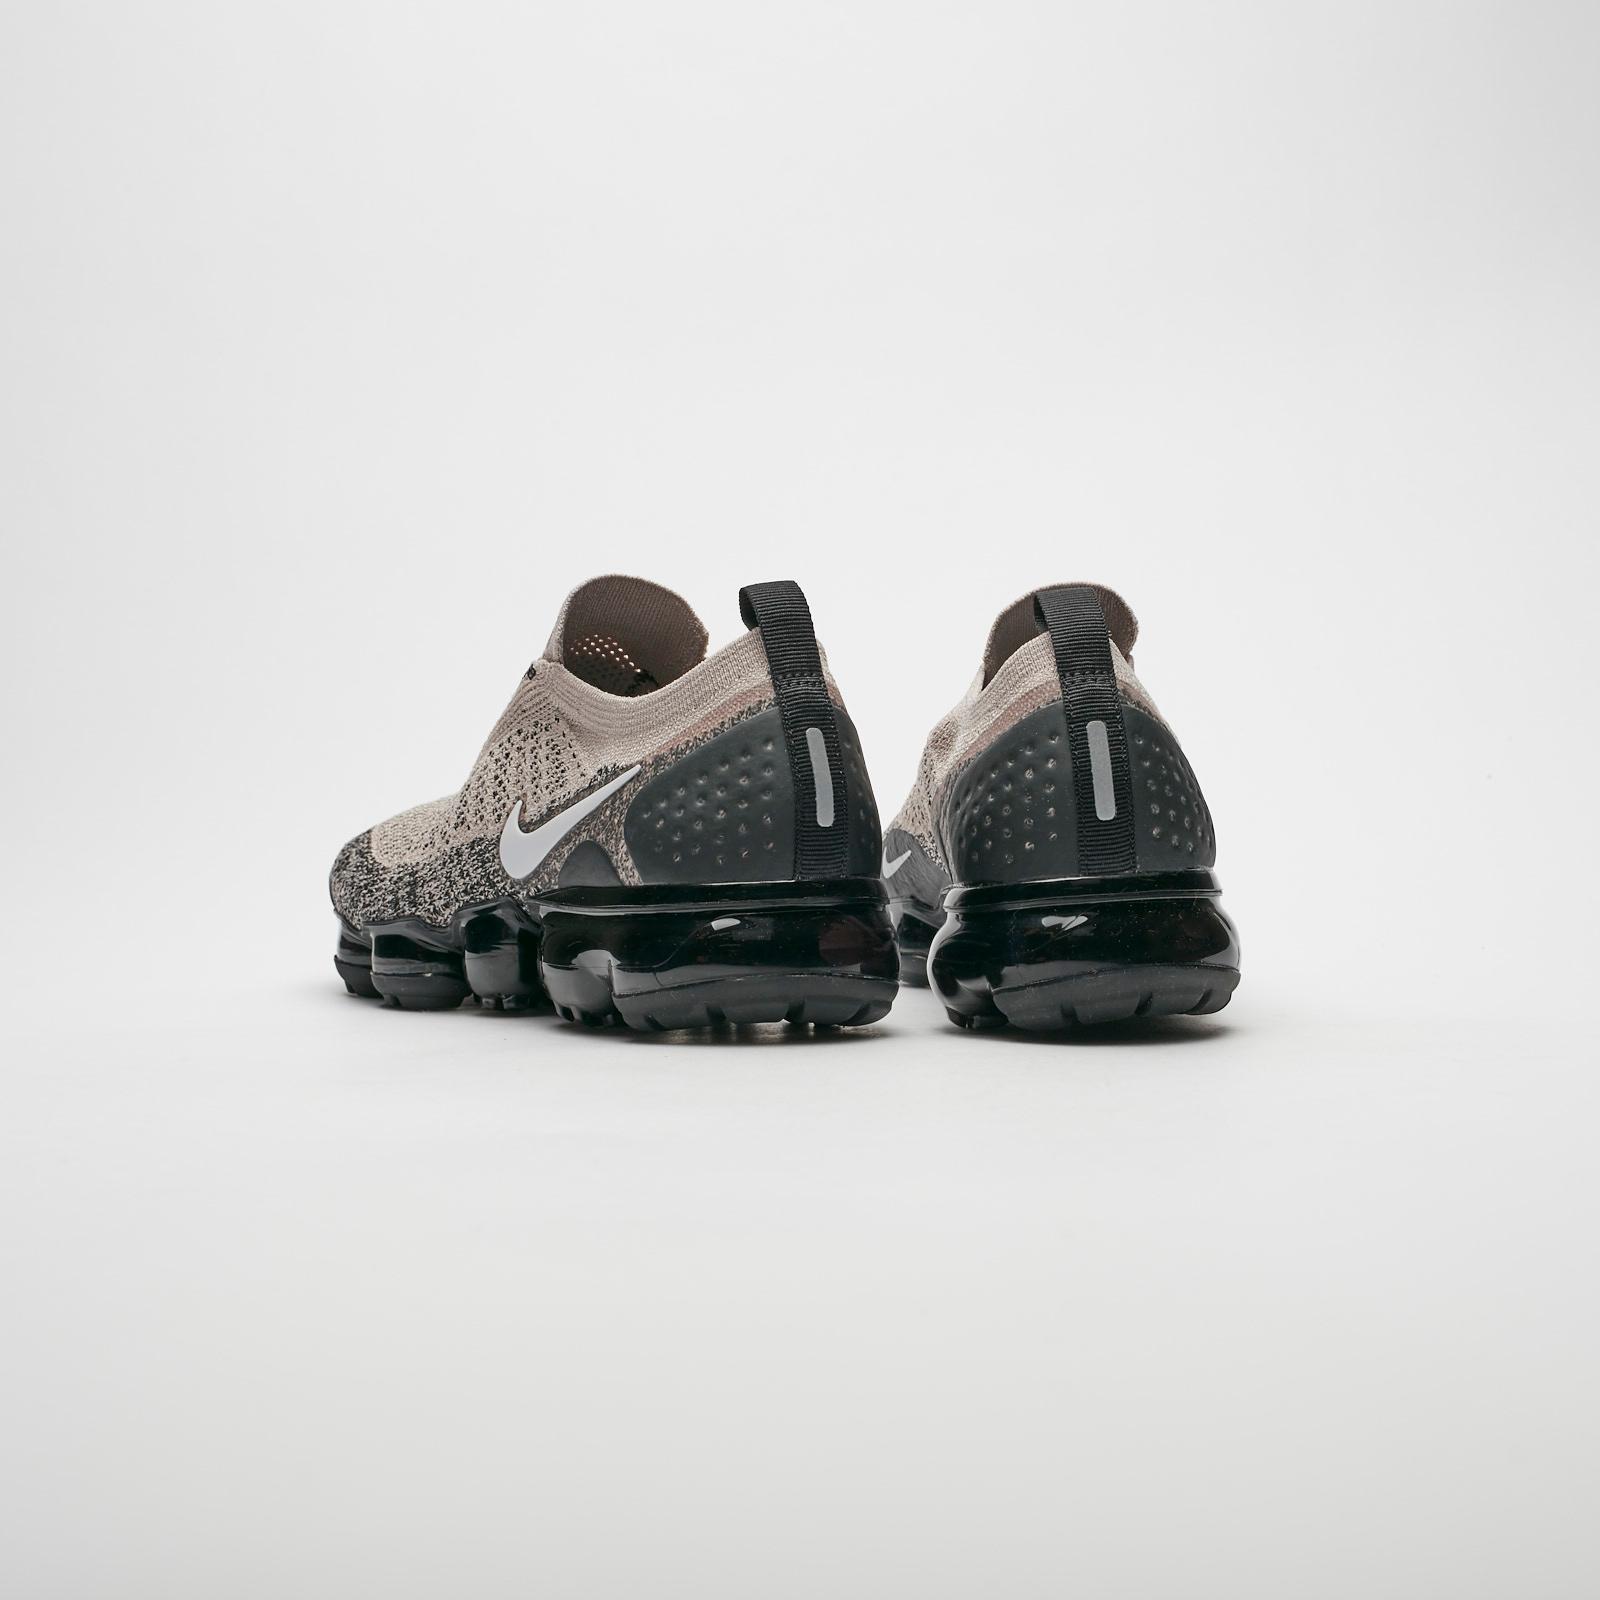 36488c485a8c1 Nike Wmns Air Vapormax FK Moc 2 - Aj6599-202 - Sneakersnstuff ...